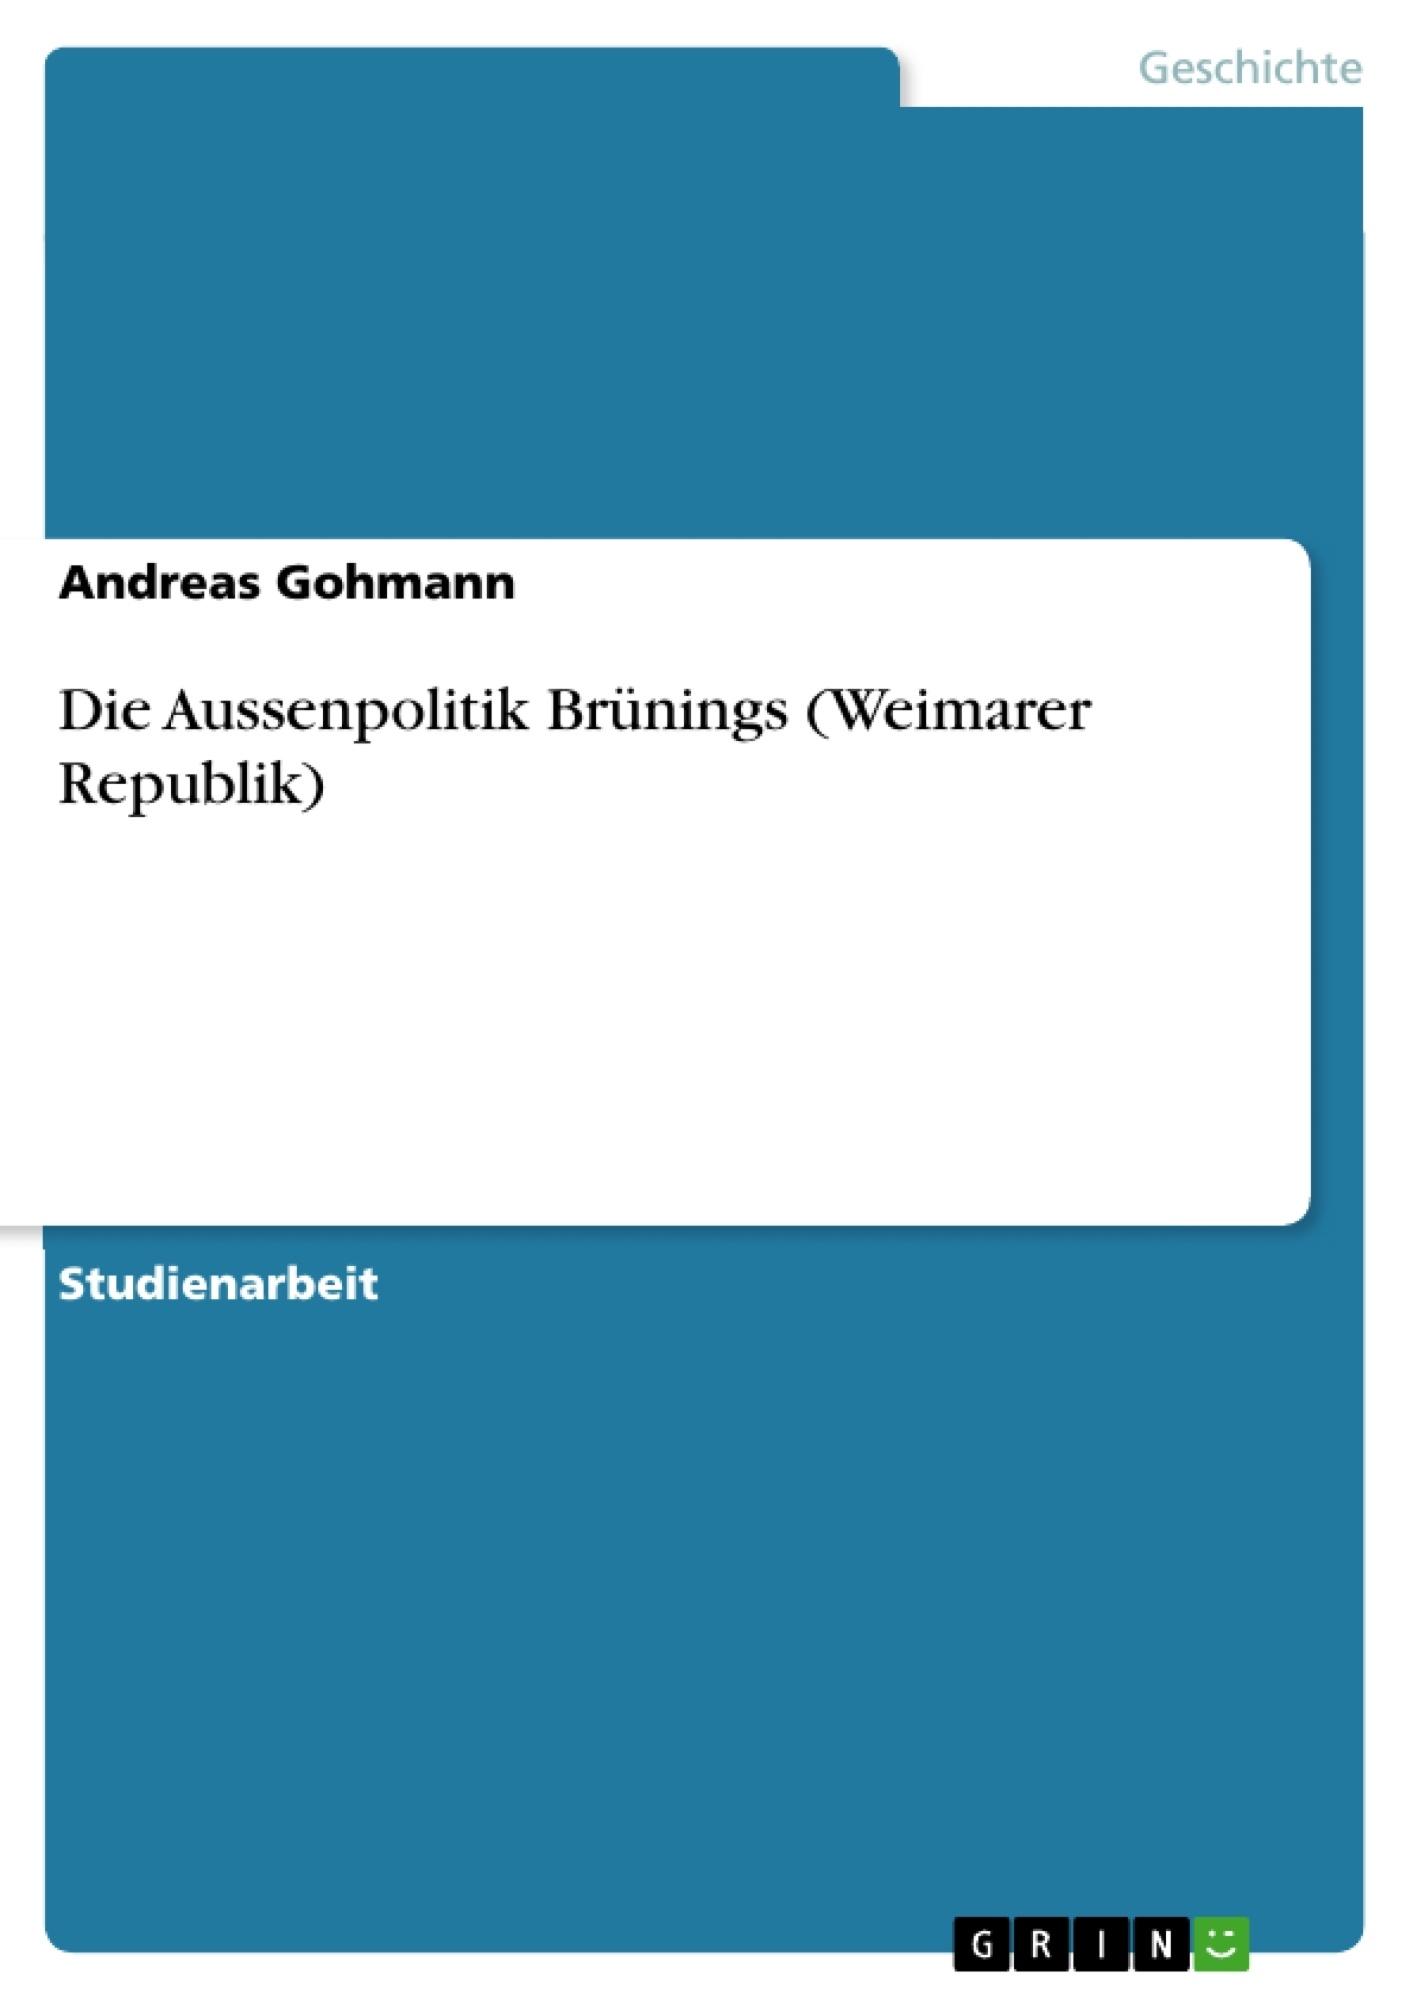 Titel: Die Aussenpolitik Brünings (Weimarer Republik)